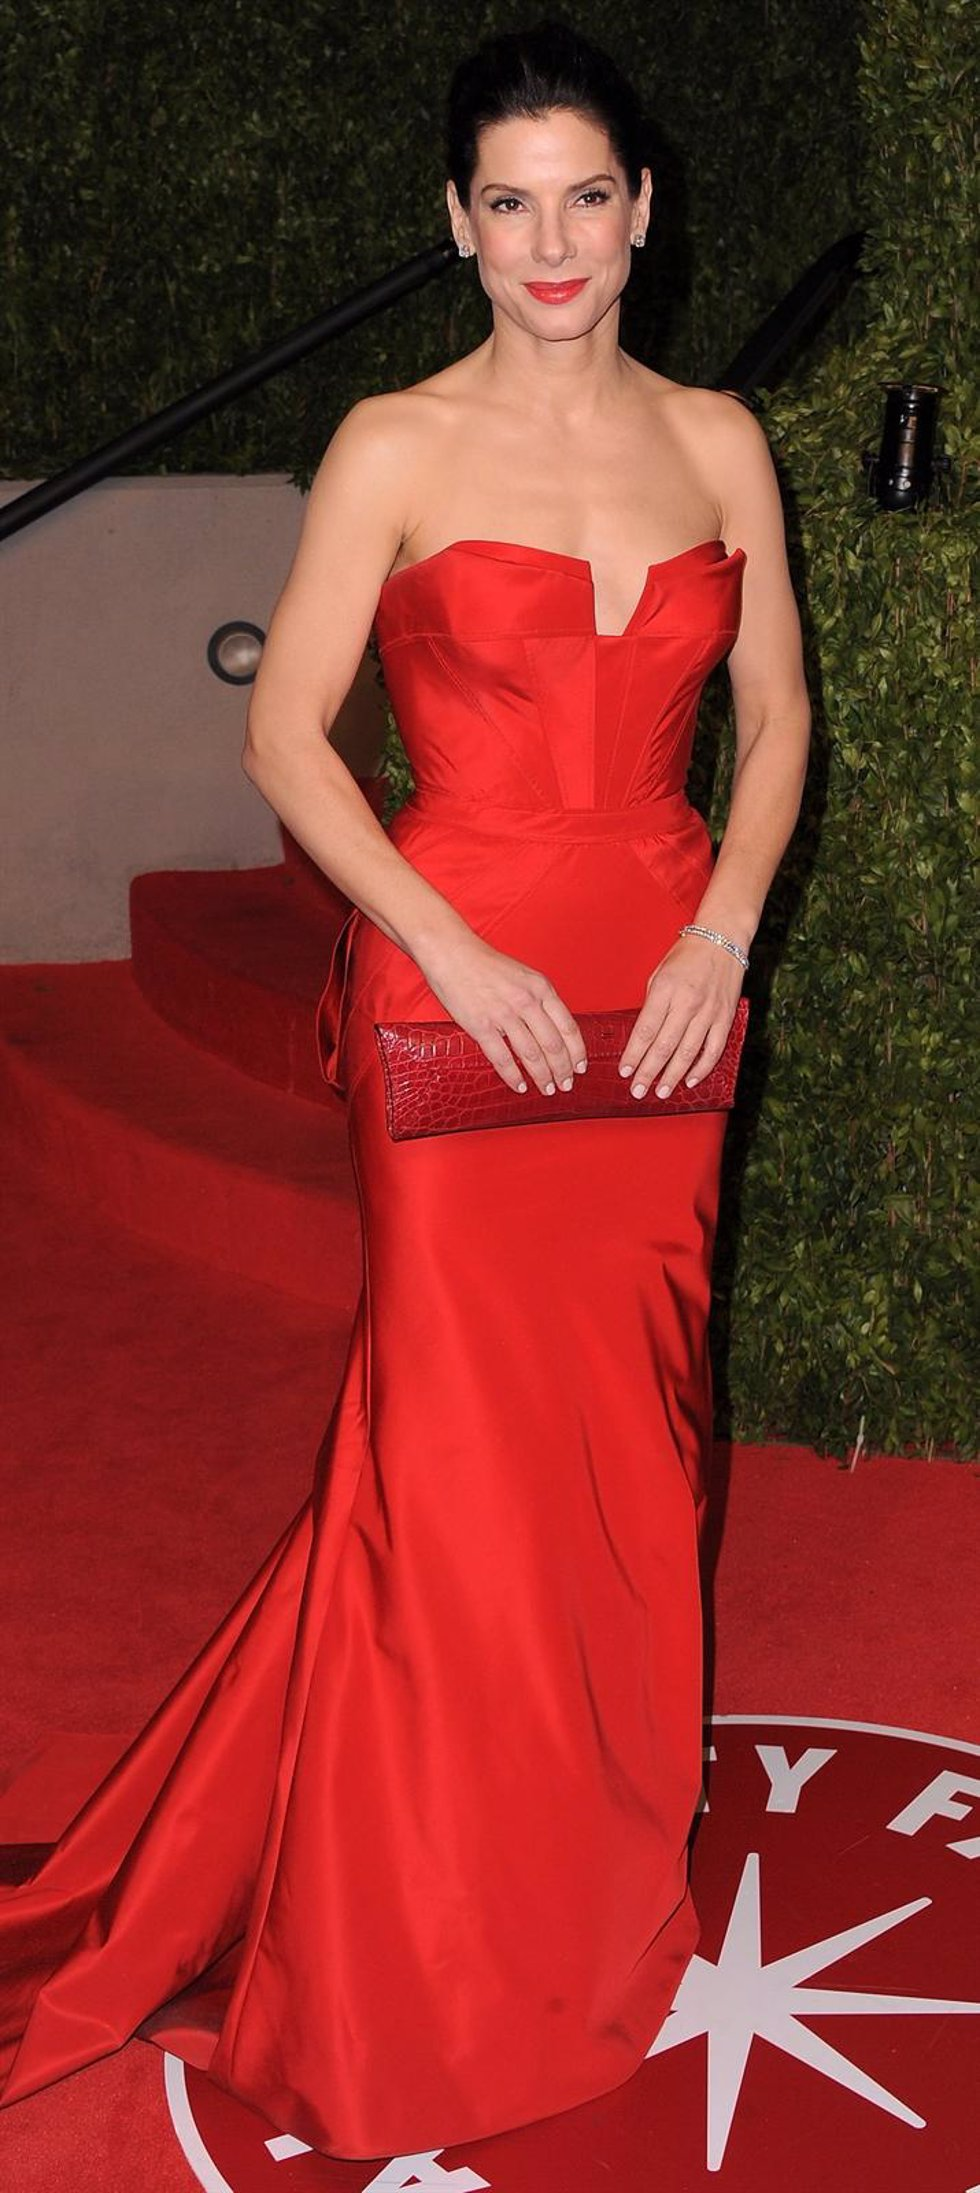 WEST HOLLYWOOD, CA - FEBRUARY 27:  Actress Sandra Bullock Arrives At The Vanity